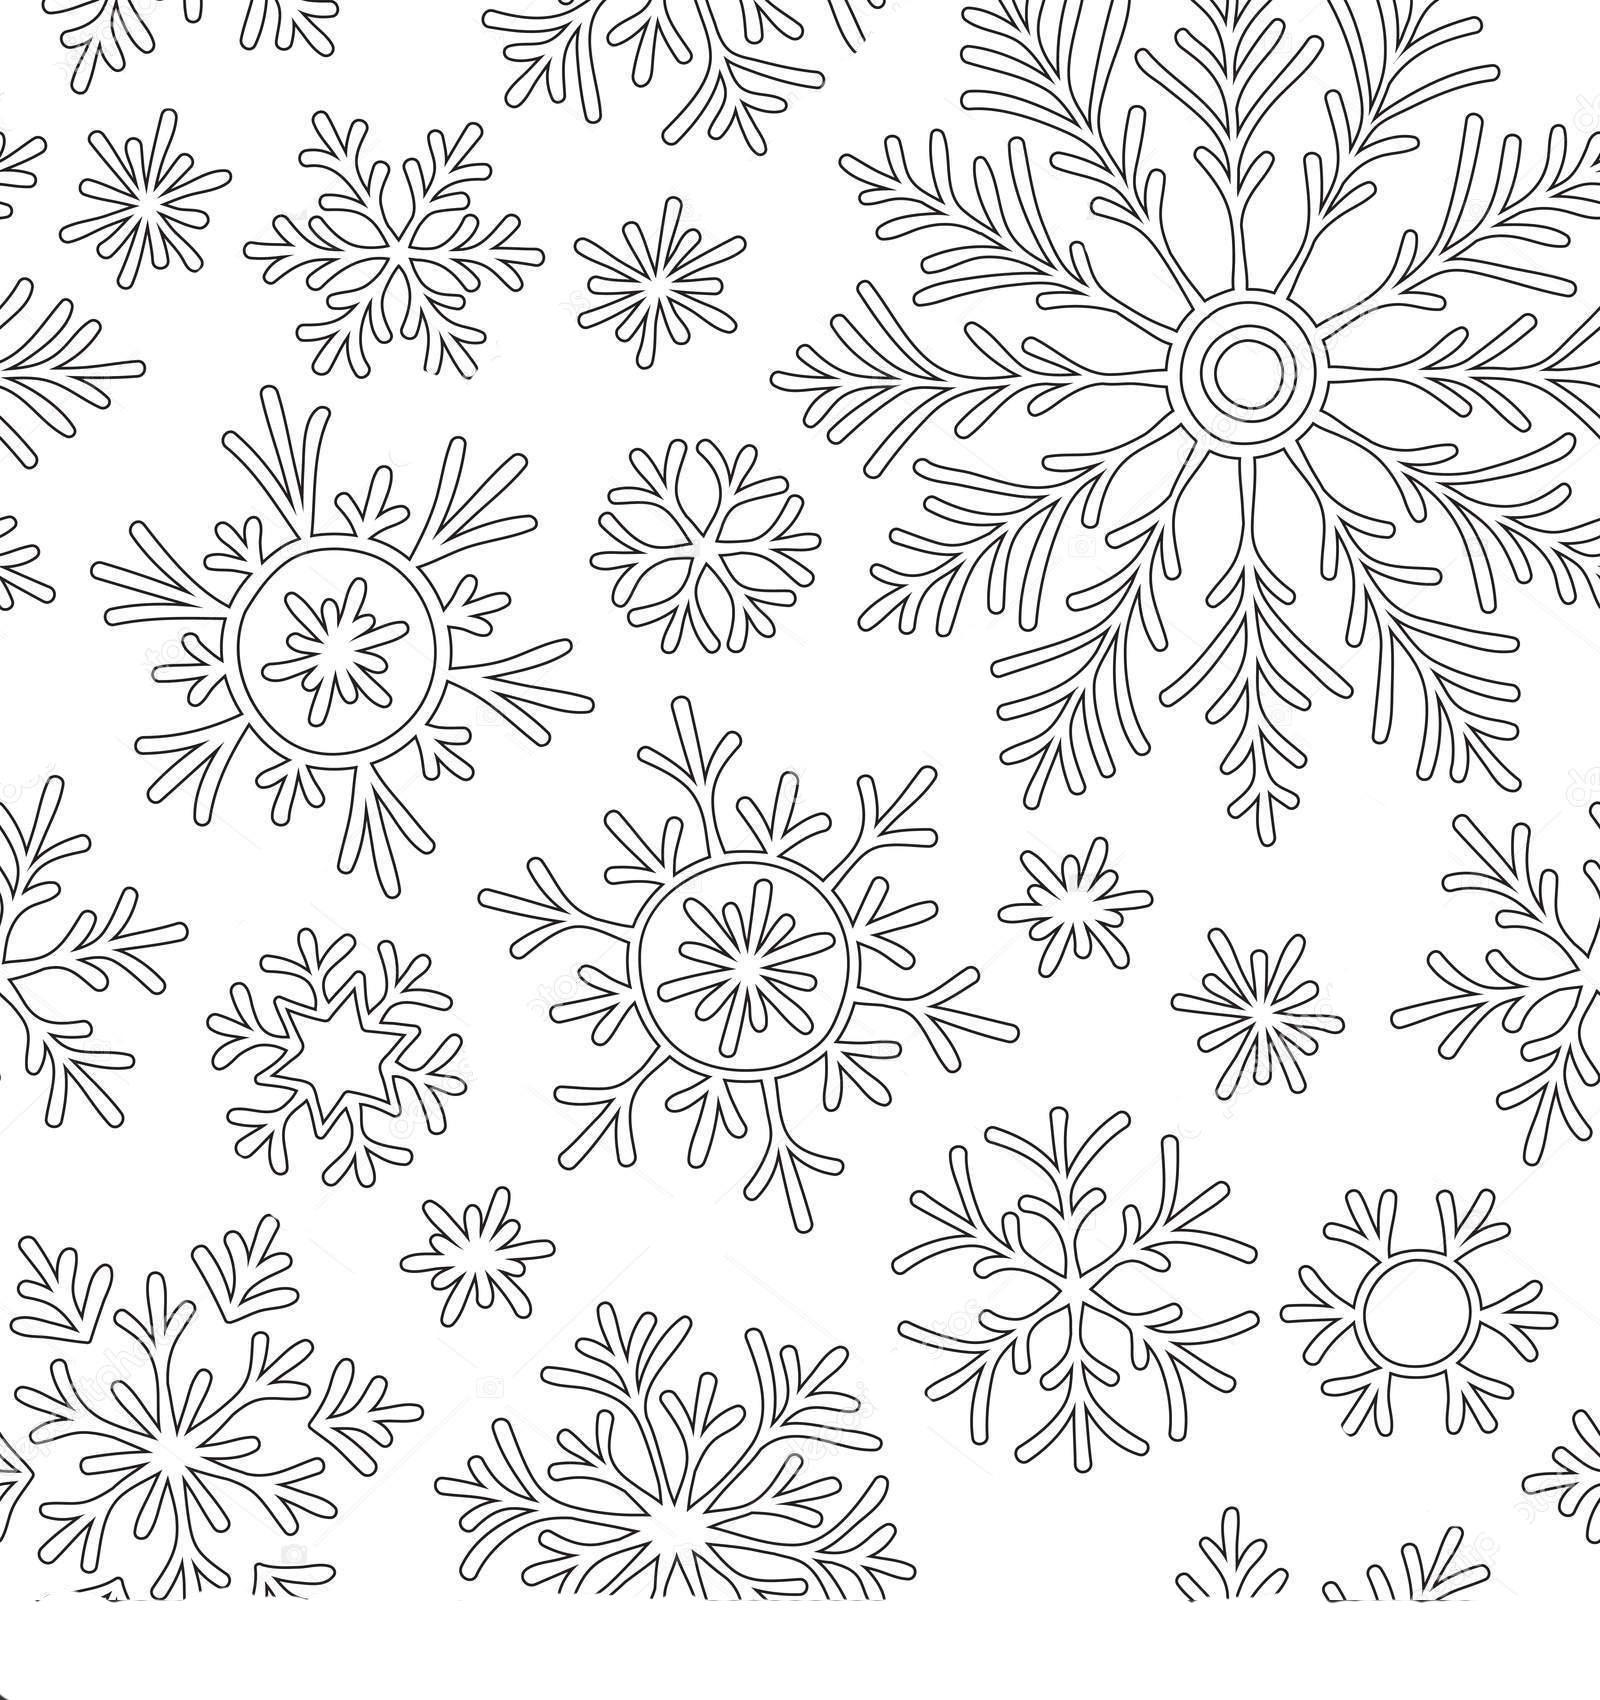 мандала снежинка раскраска